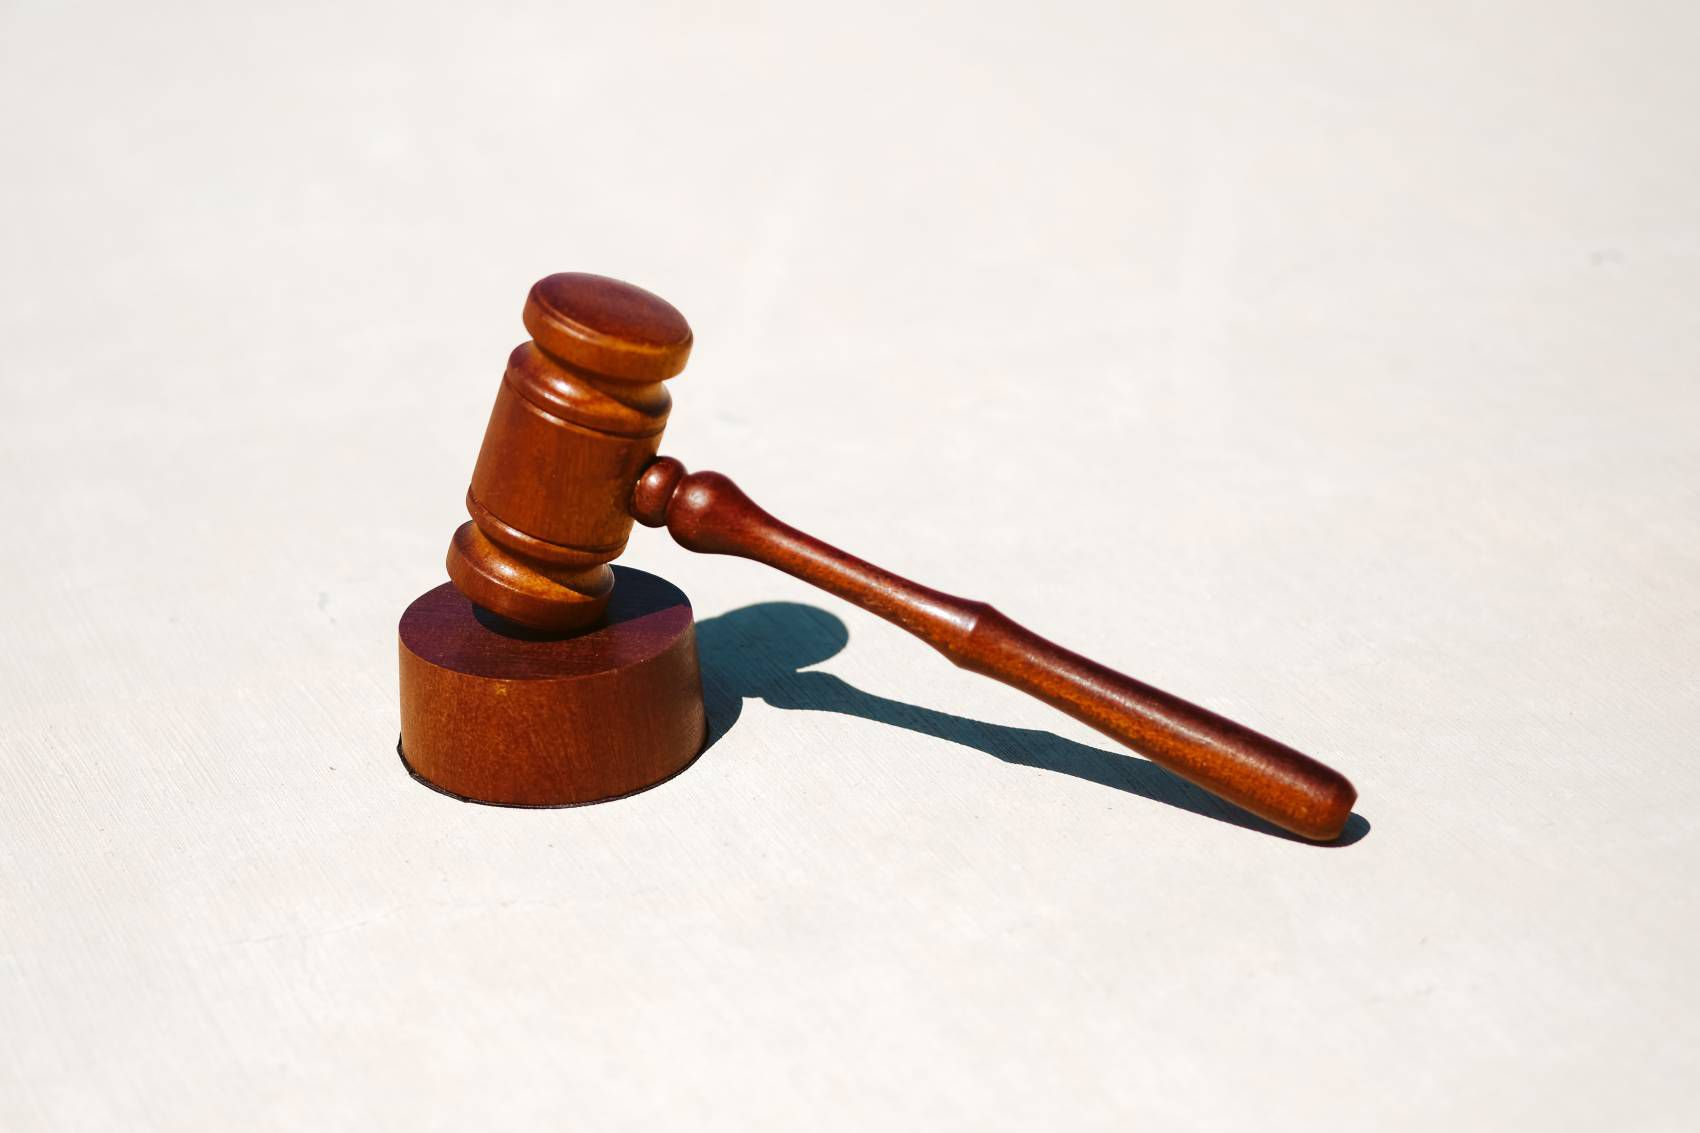 Un marteau de justice.